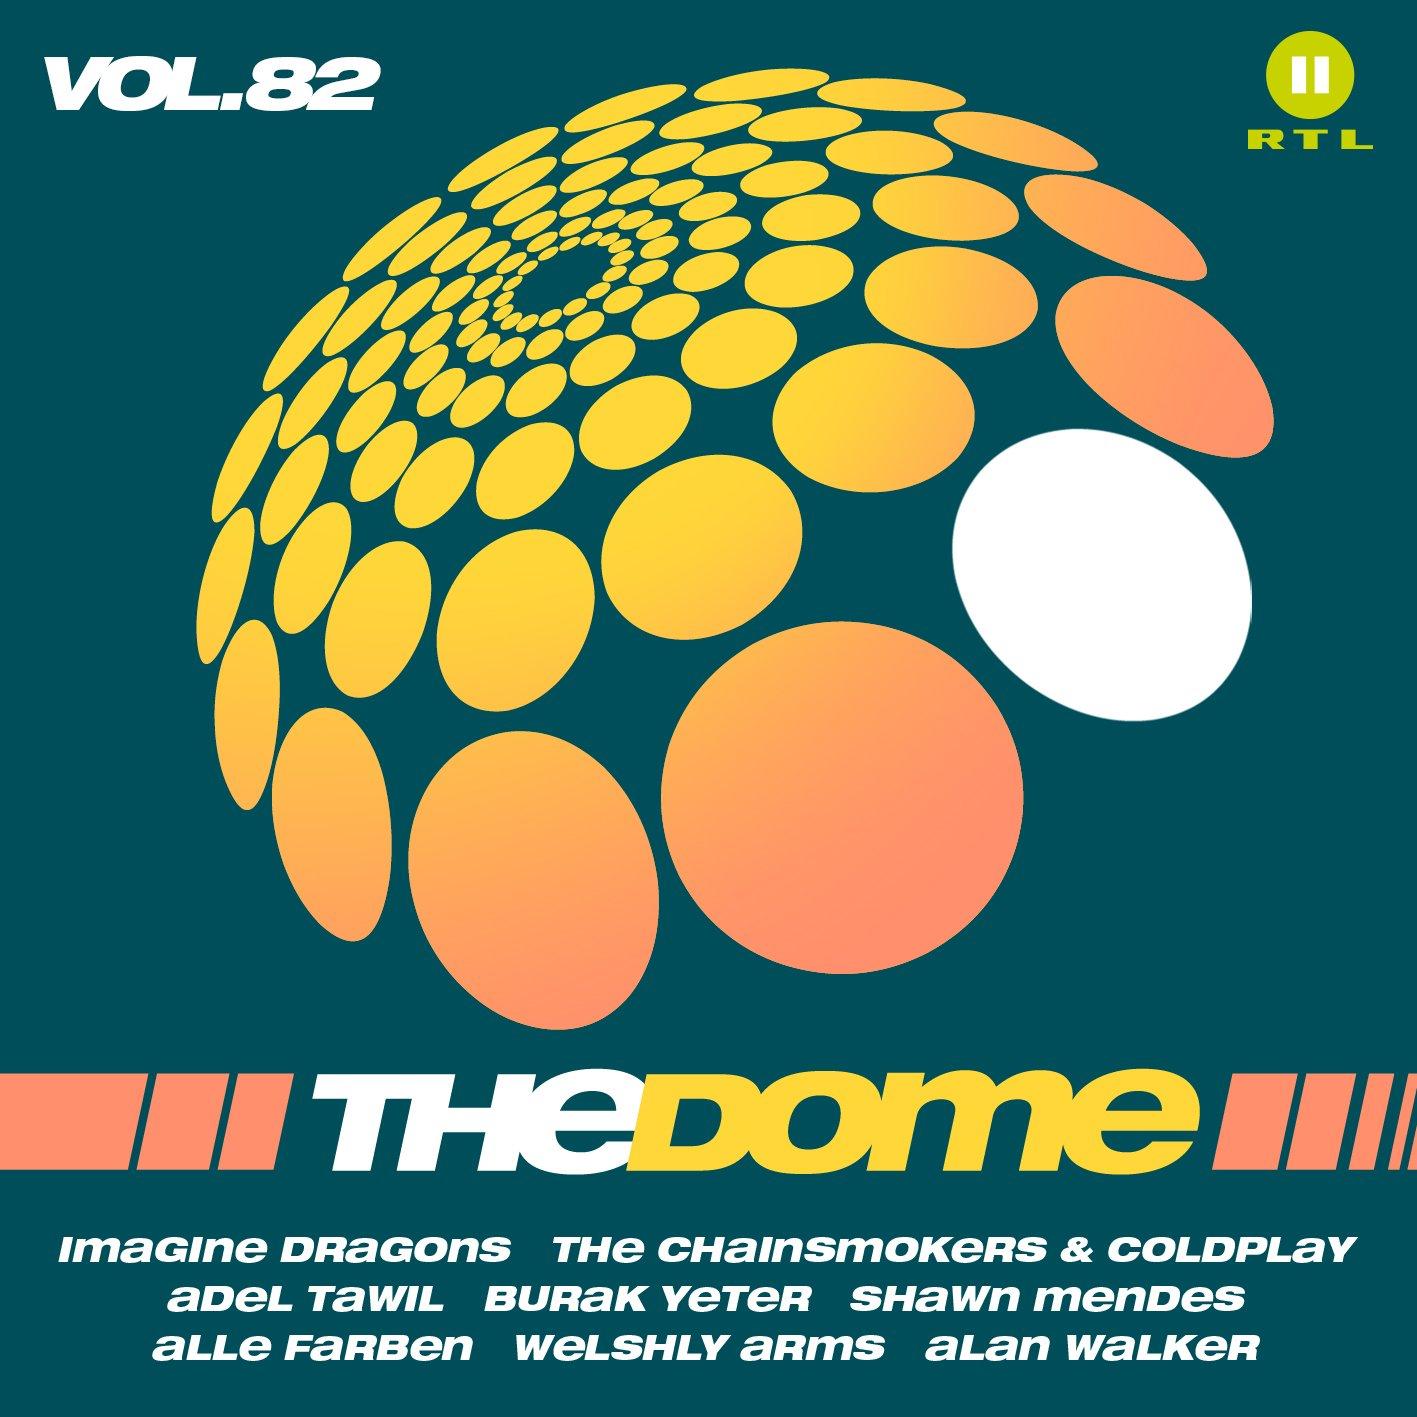 VA - The Dome Vol. 82 - 2CD - FLAC - 2017 - VOLDiES Download